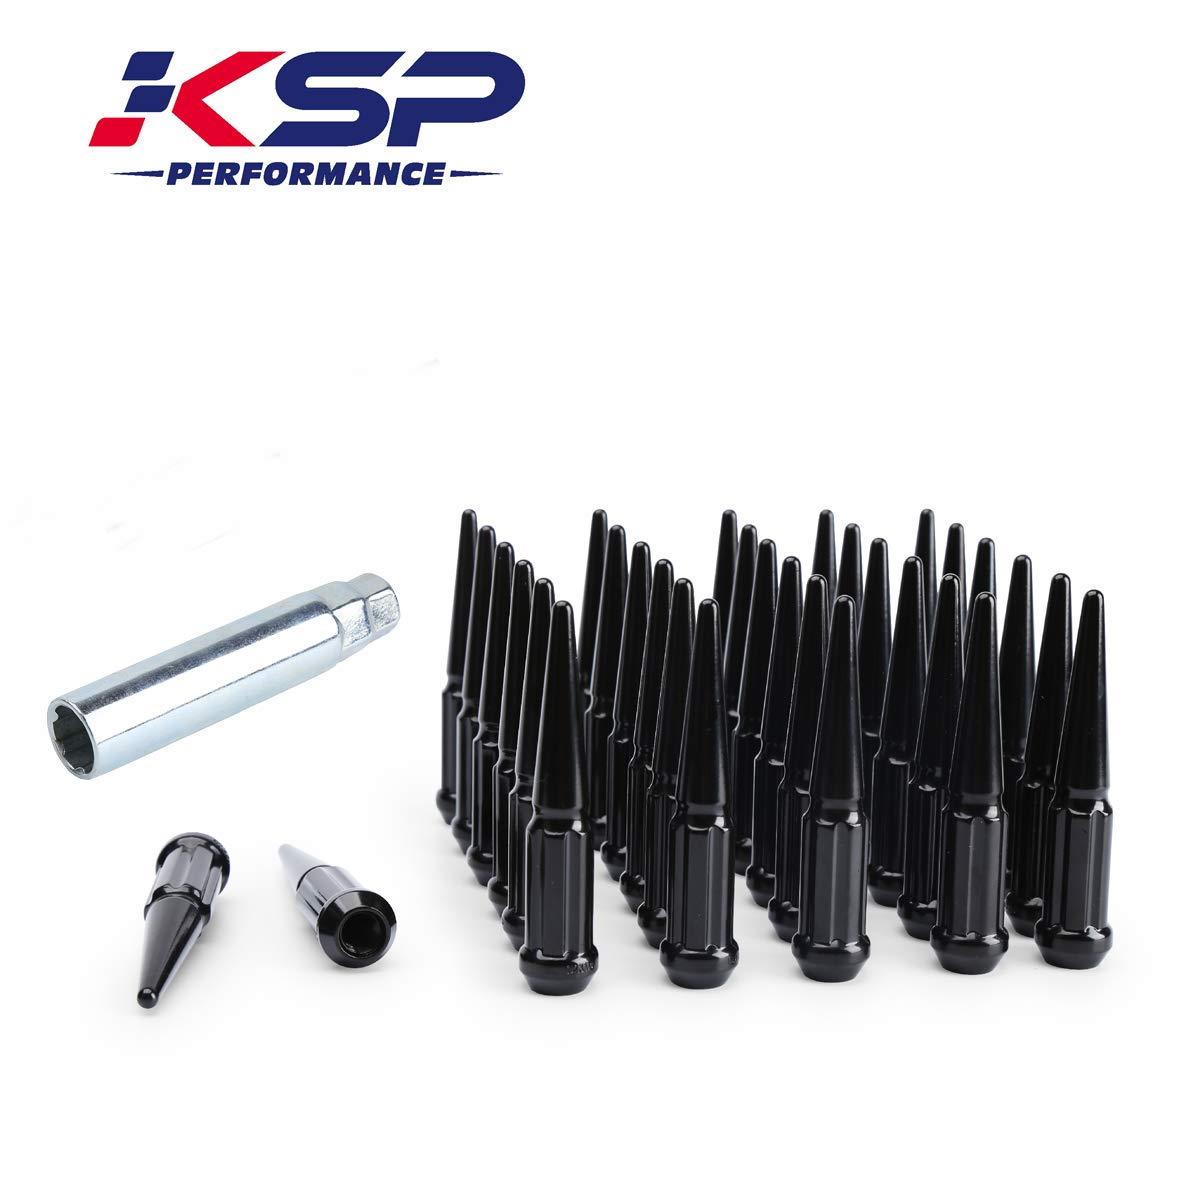 KSP 6 Spline Spike Lug Nuts, 32 pcs Thread Pitch 9/16-18 Over Length 4.4'' Closed End Spike Solid Metal Lug Nuts Chrome with 1 Socket Key, 1 Year Warranty